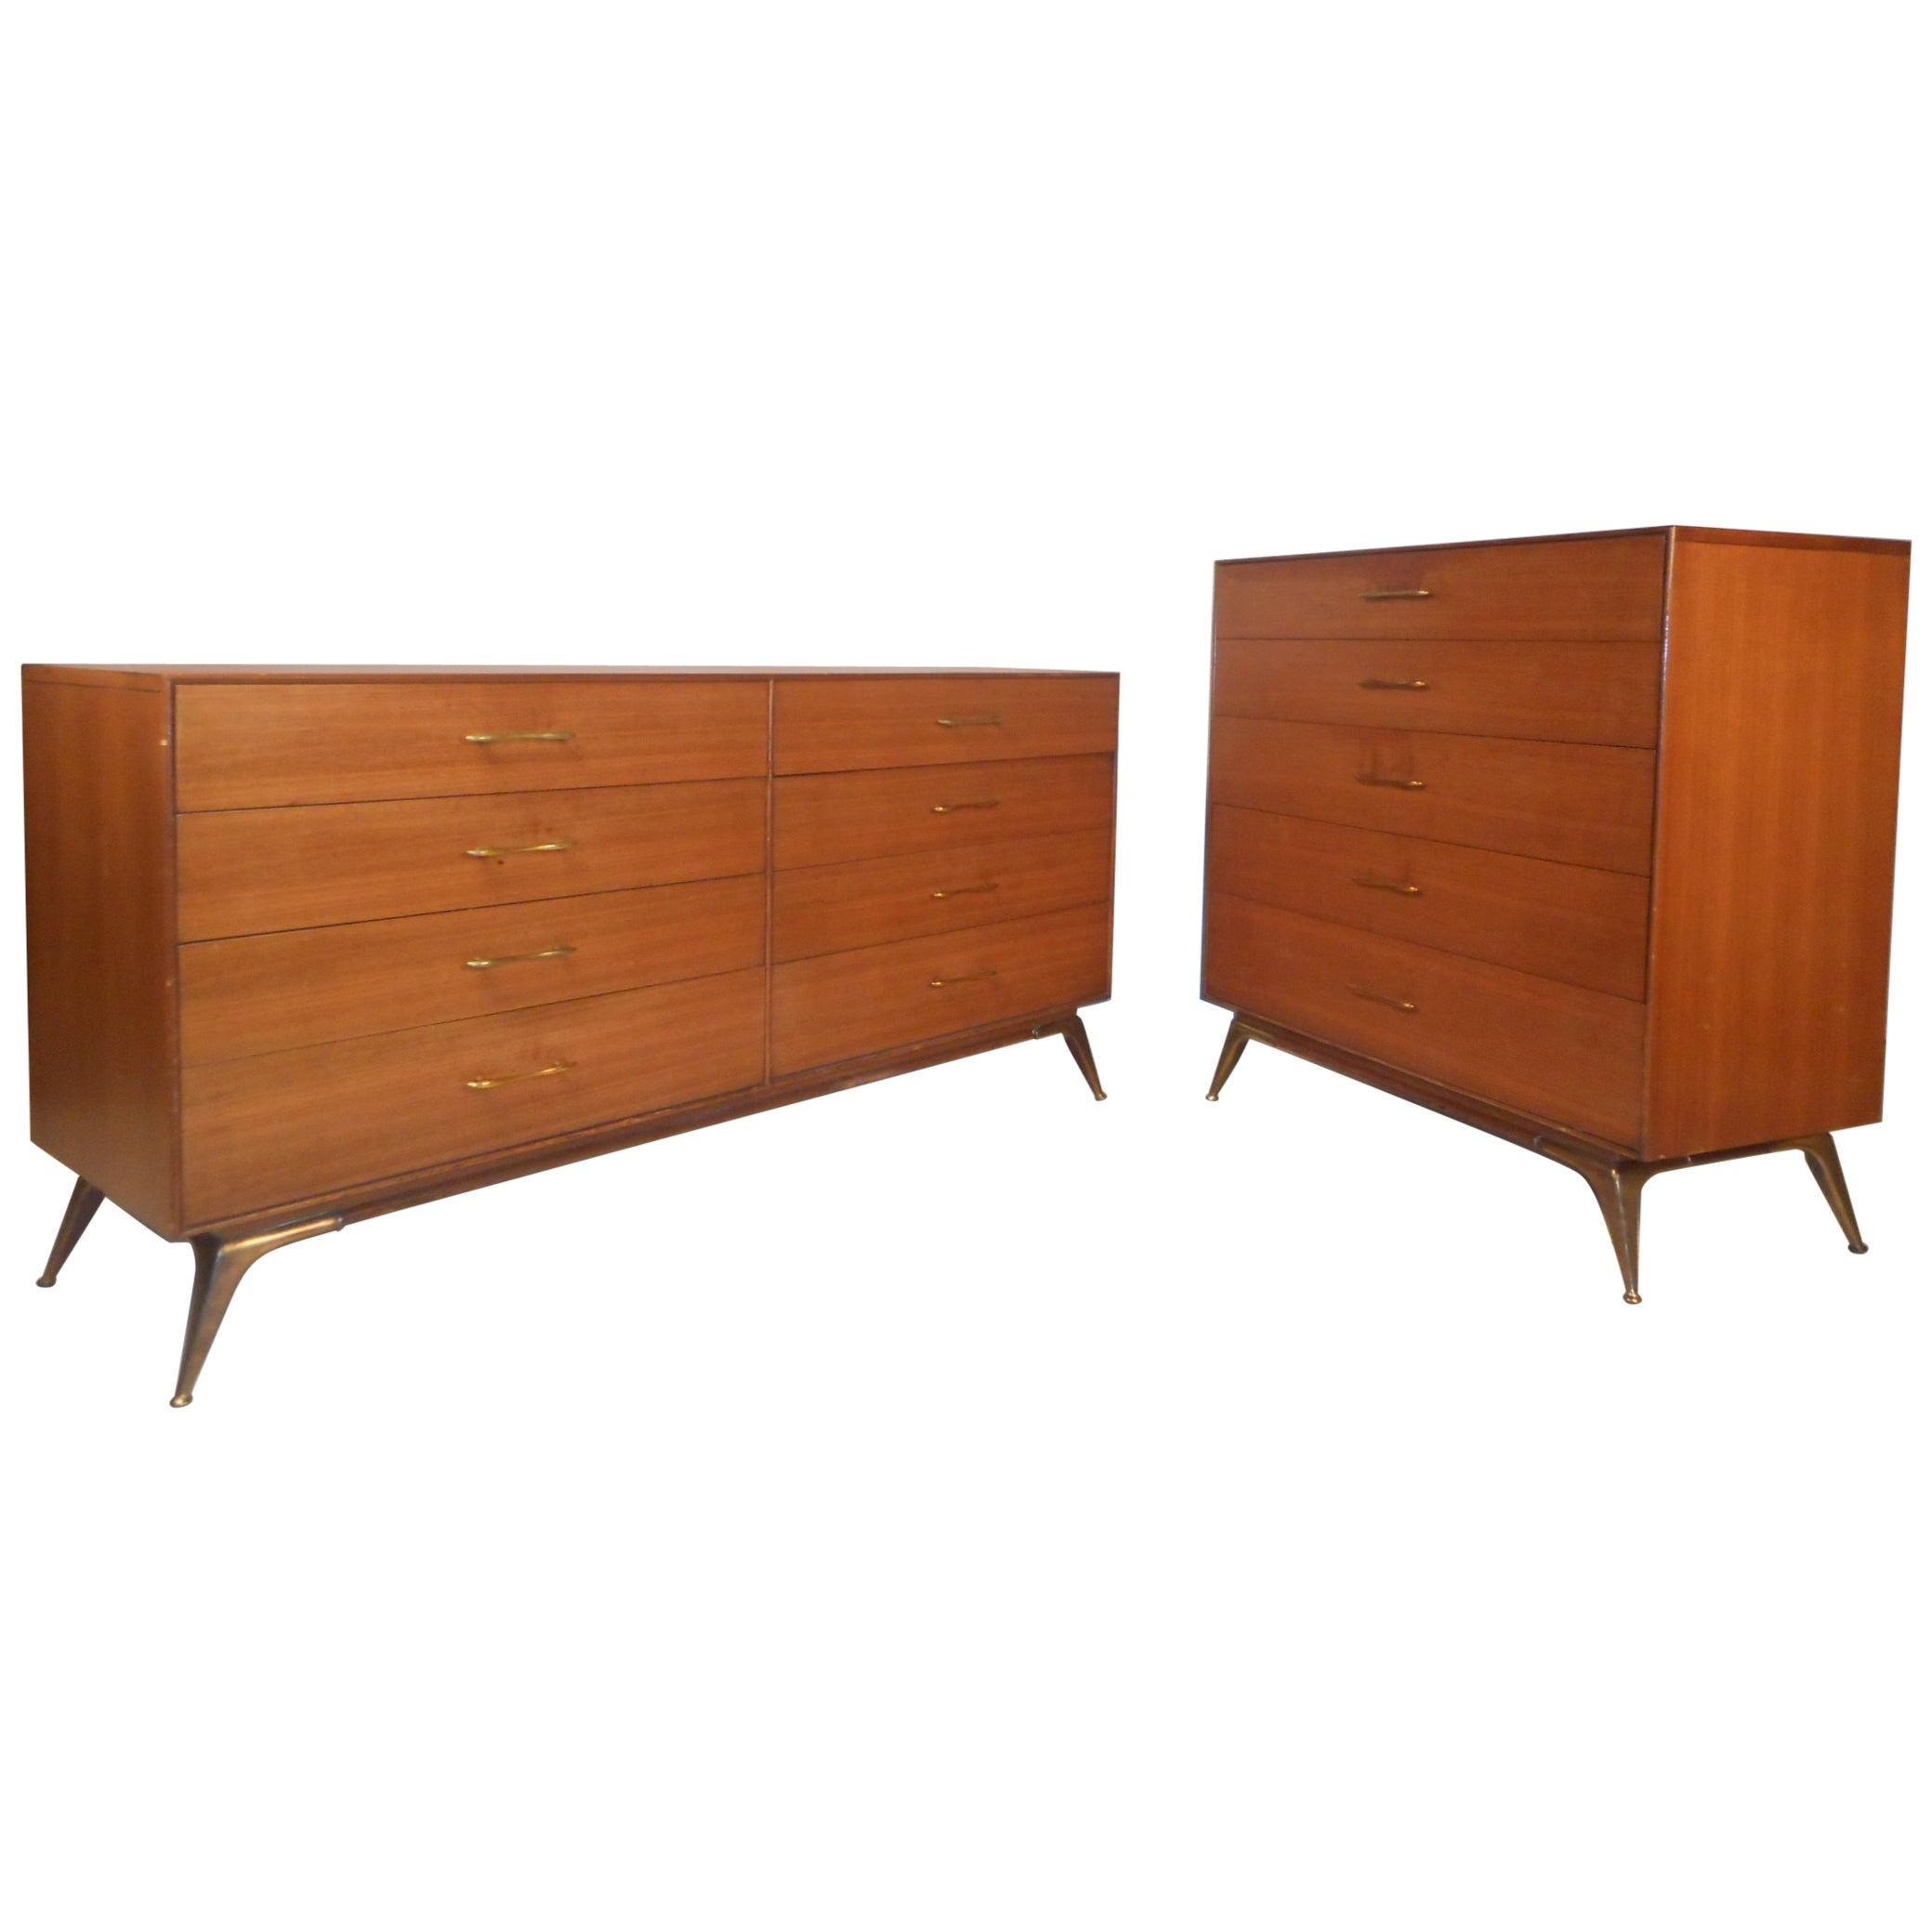 Mid-Century Modern Bedroom Set by R-Way Furniture